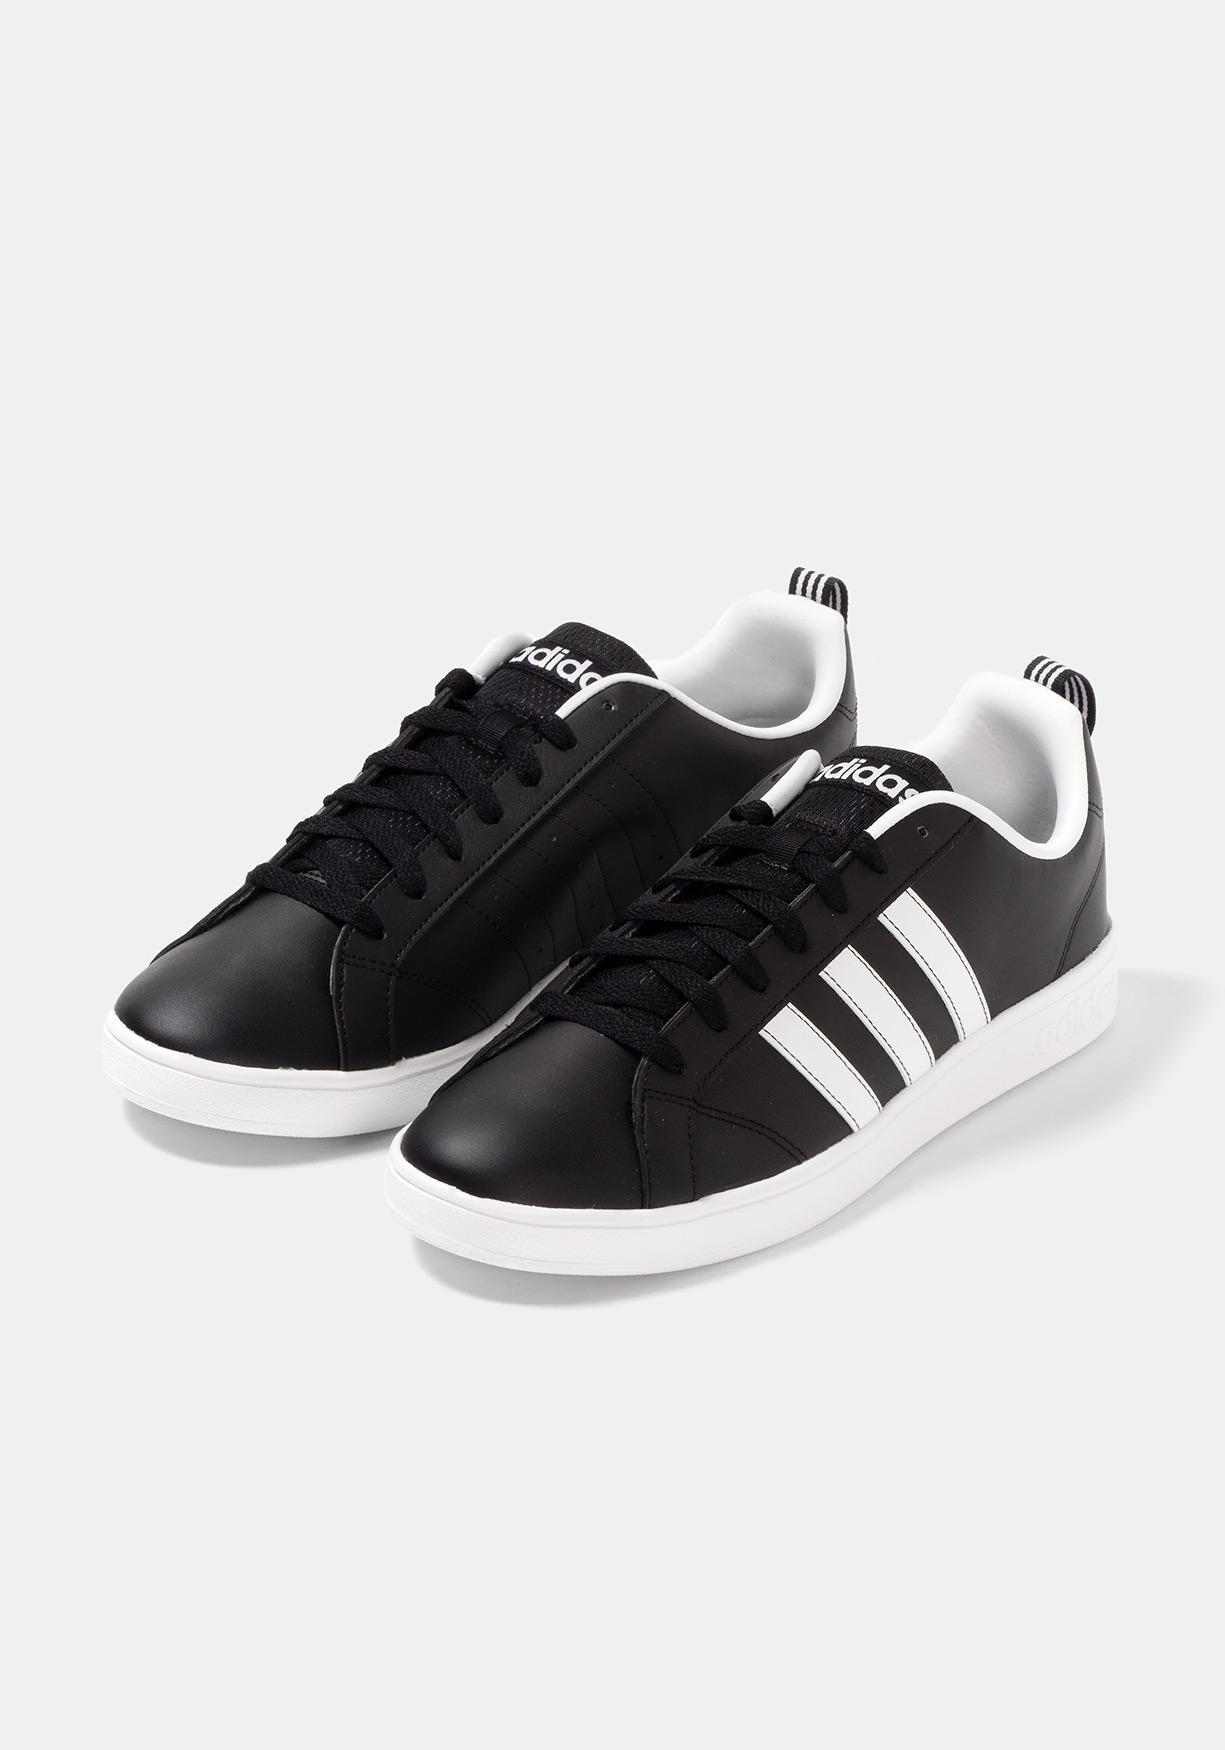 best sneakers d9559 bfe0b Zapatillas de deporte ADIDAS